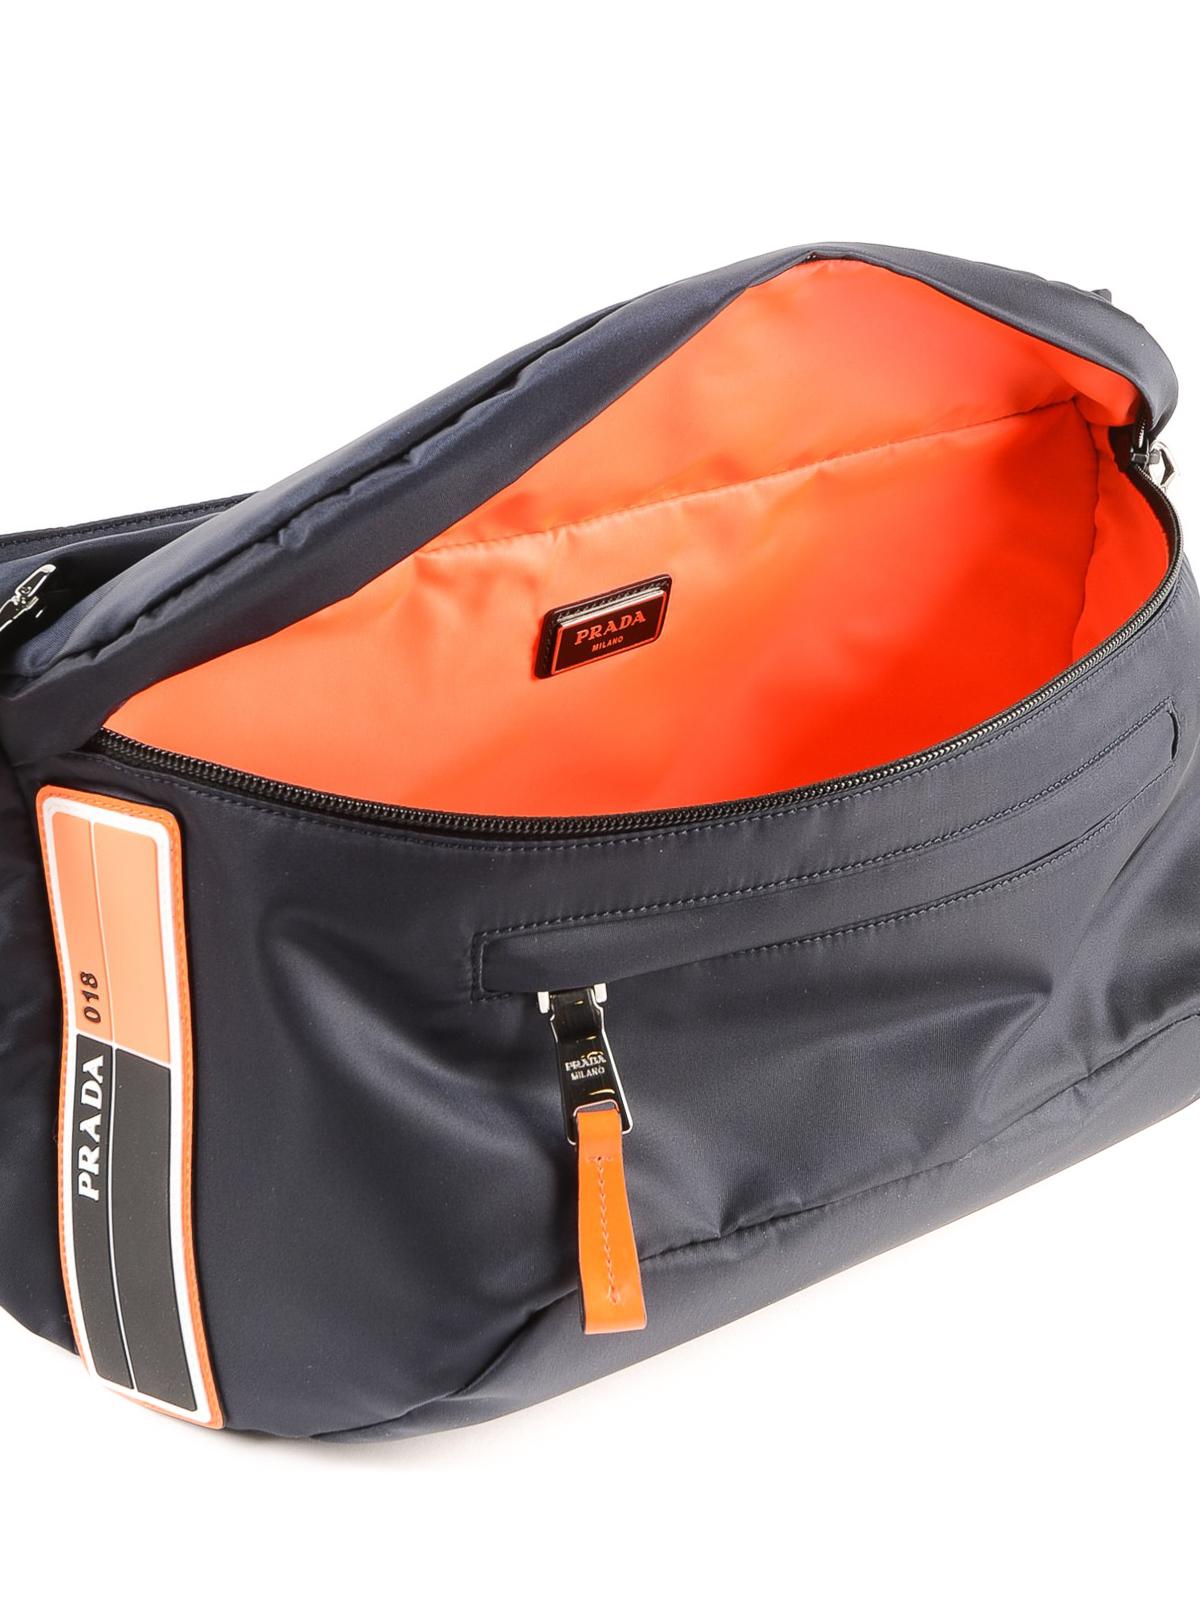 1ce14d344c96b5 Prada - Dark blue nylon belt bag - belt bags - 2VL0042BTE XVT ...